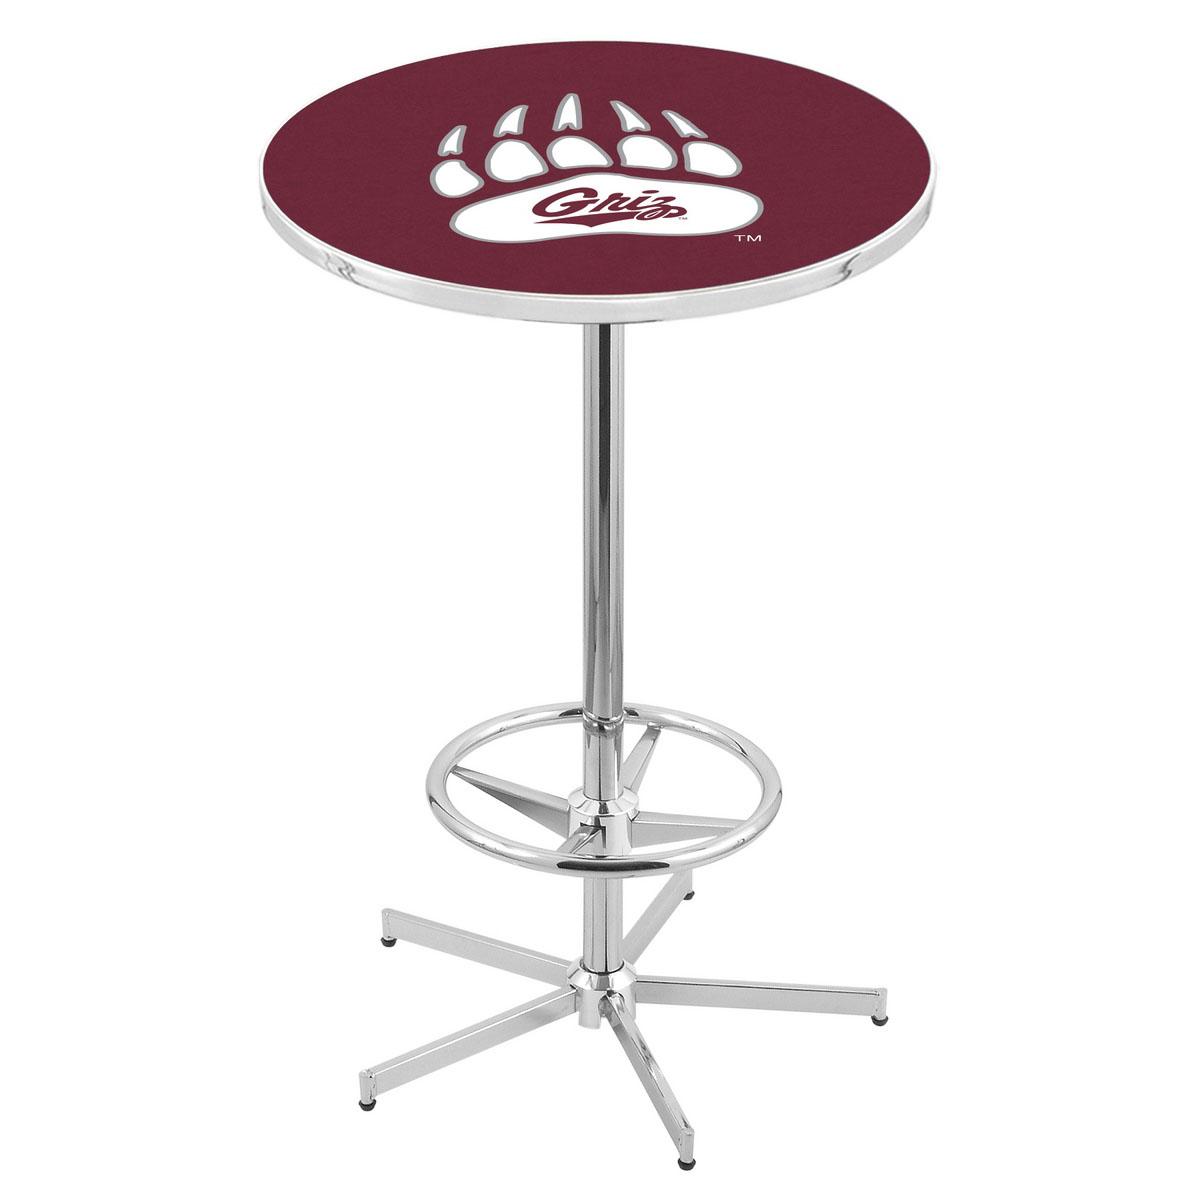 Popular Chrome Montana Pub Table Product Photo